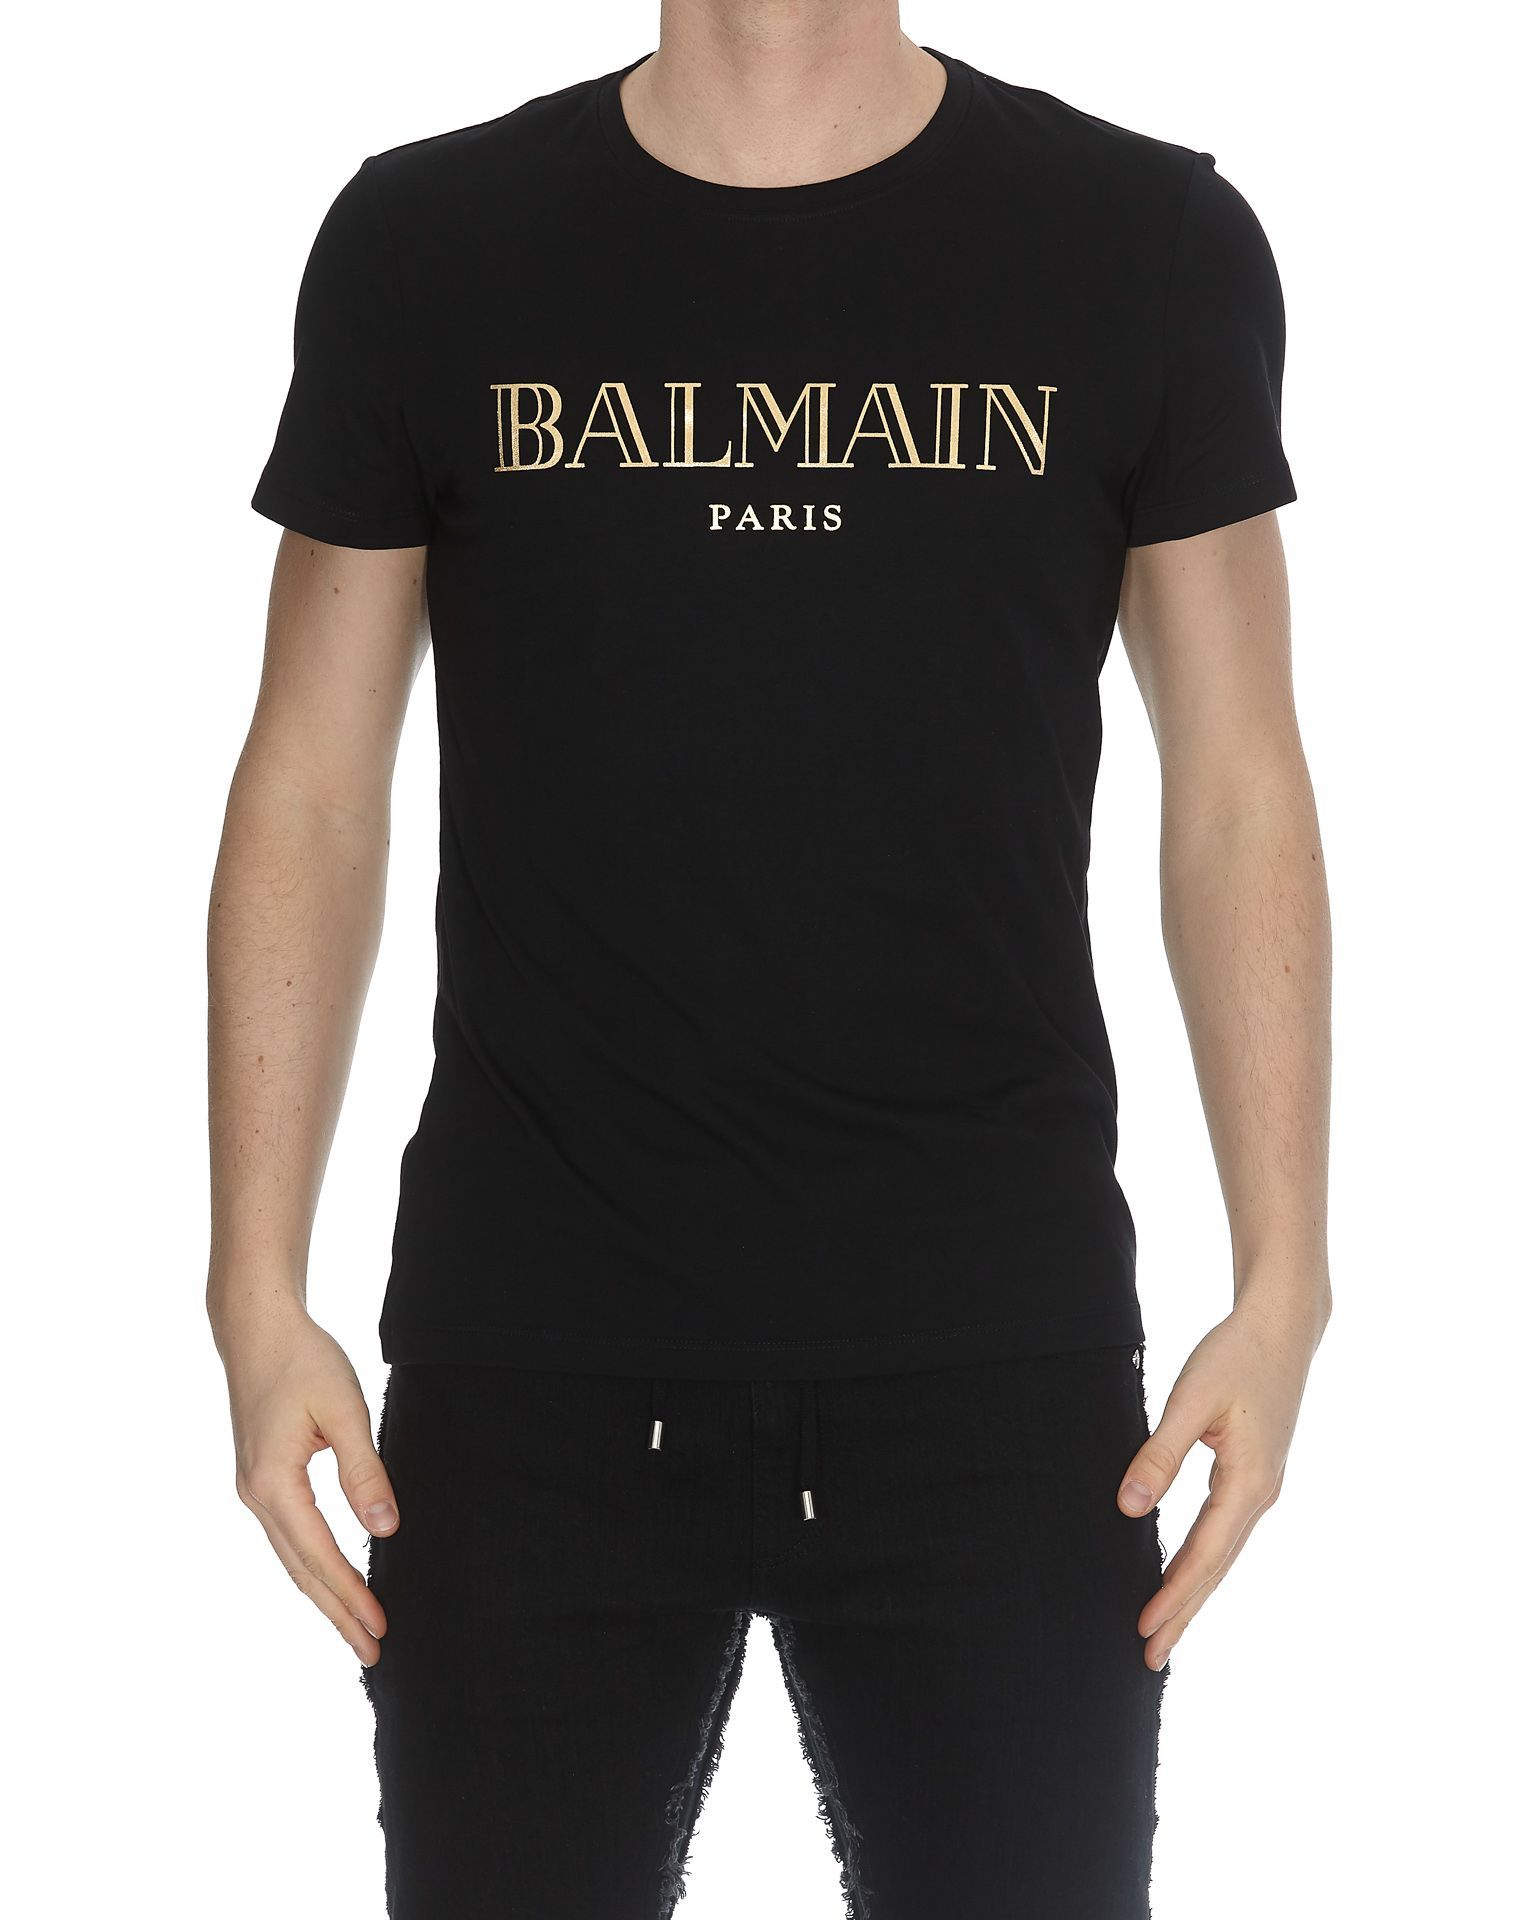 balmain t shirt for men